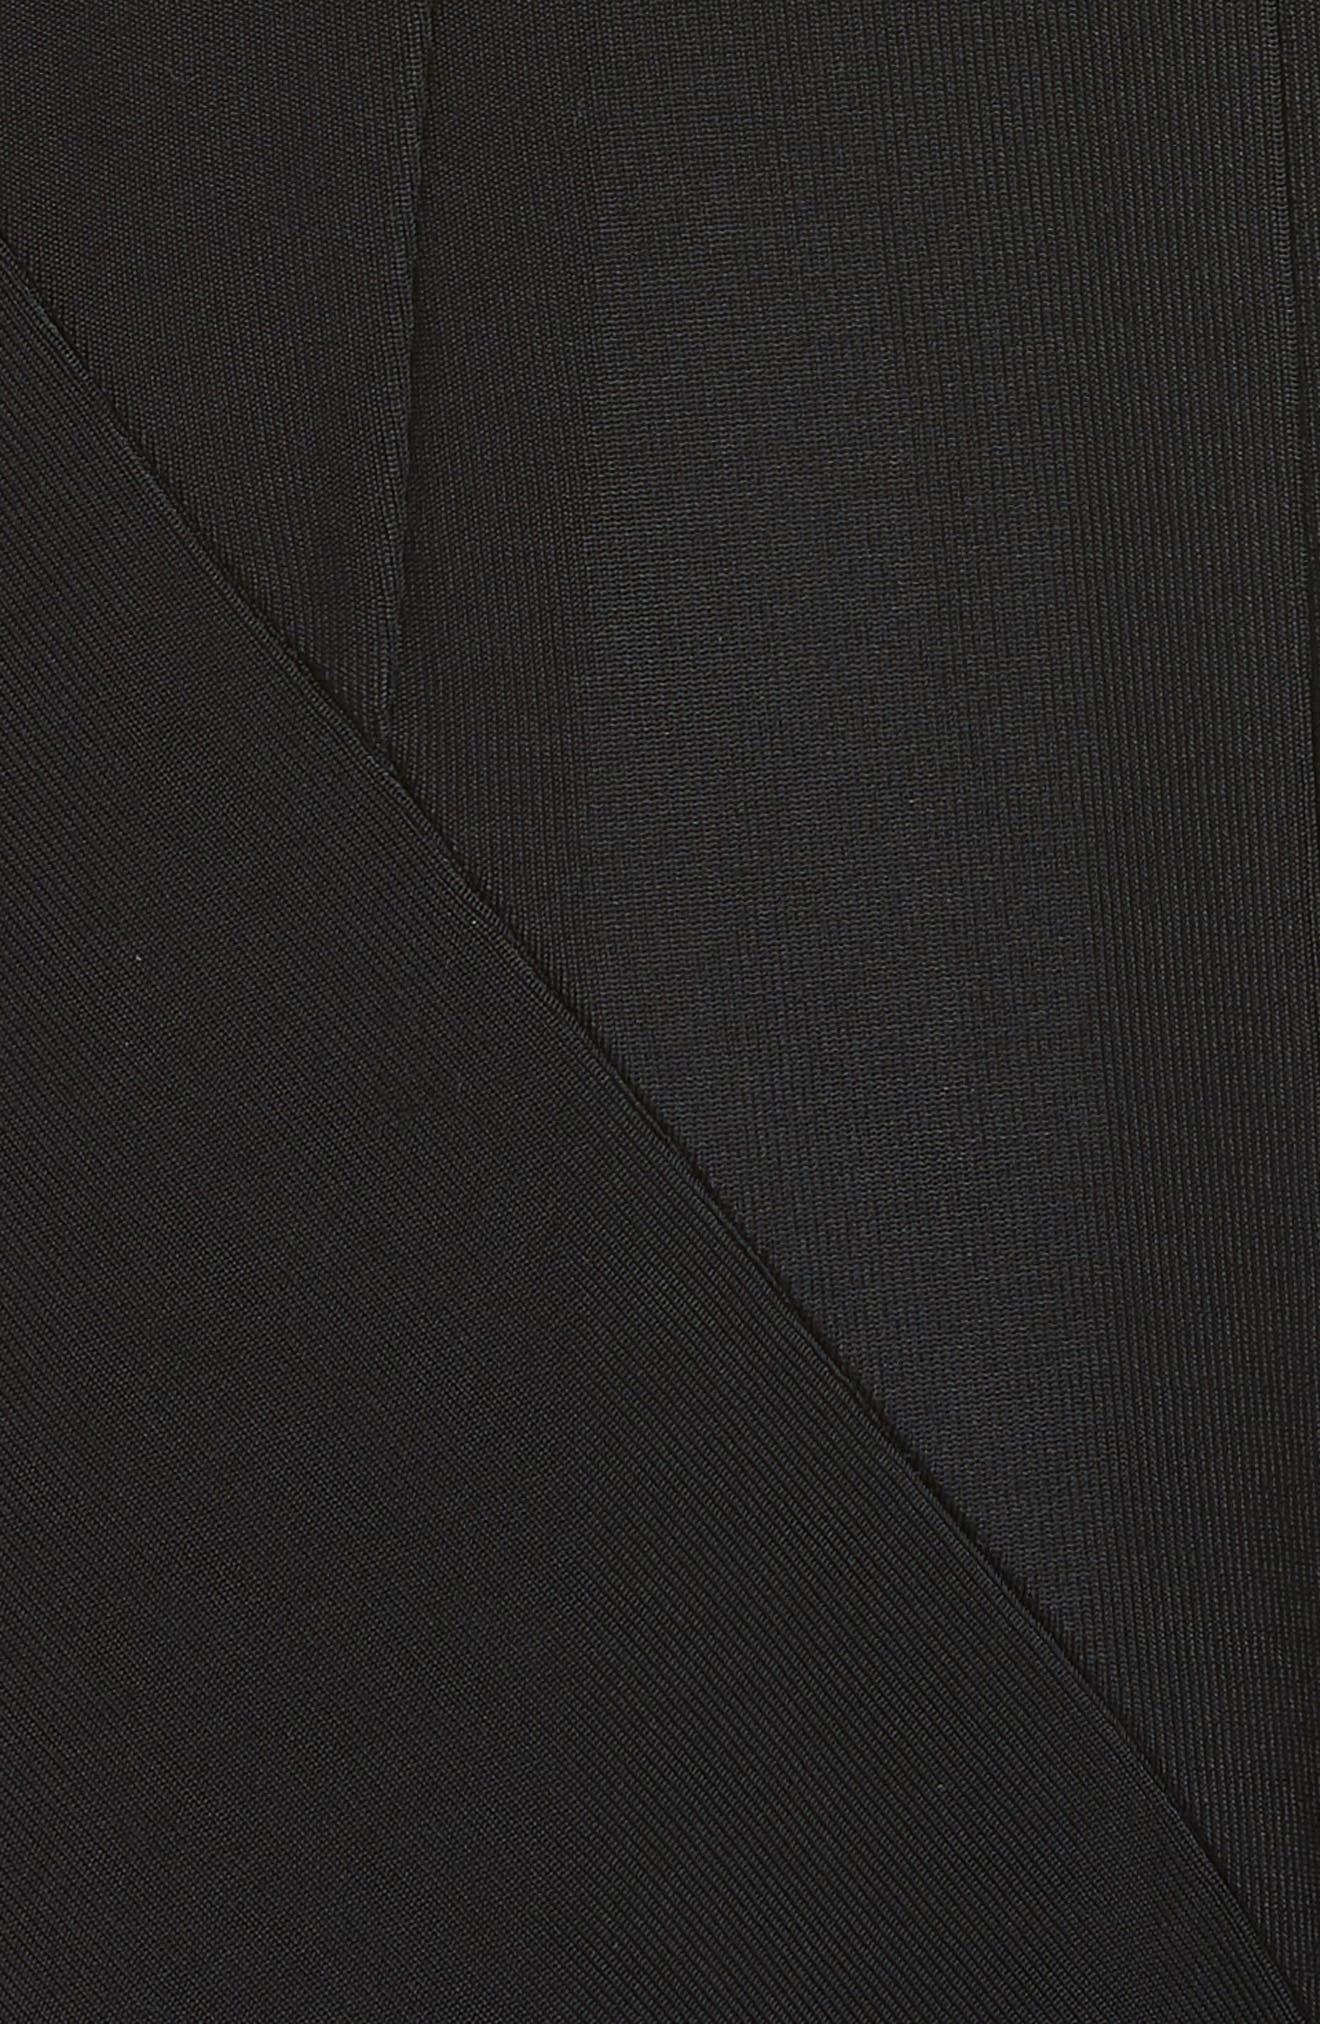 Colorblock Asymmetrical Gown,                             Alternate thumbnail 5, color,                             Black W/ White